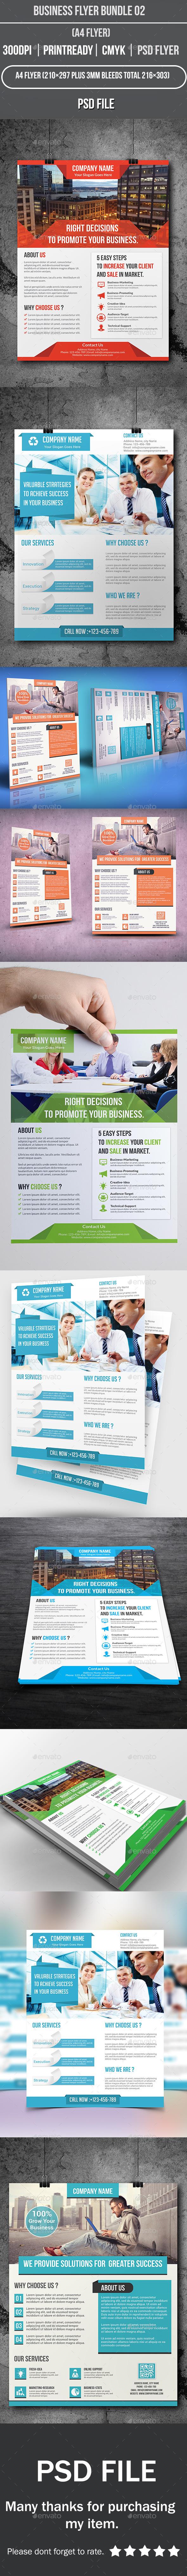 Business Flyer Bundle 02 - Corporate Flyers